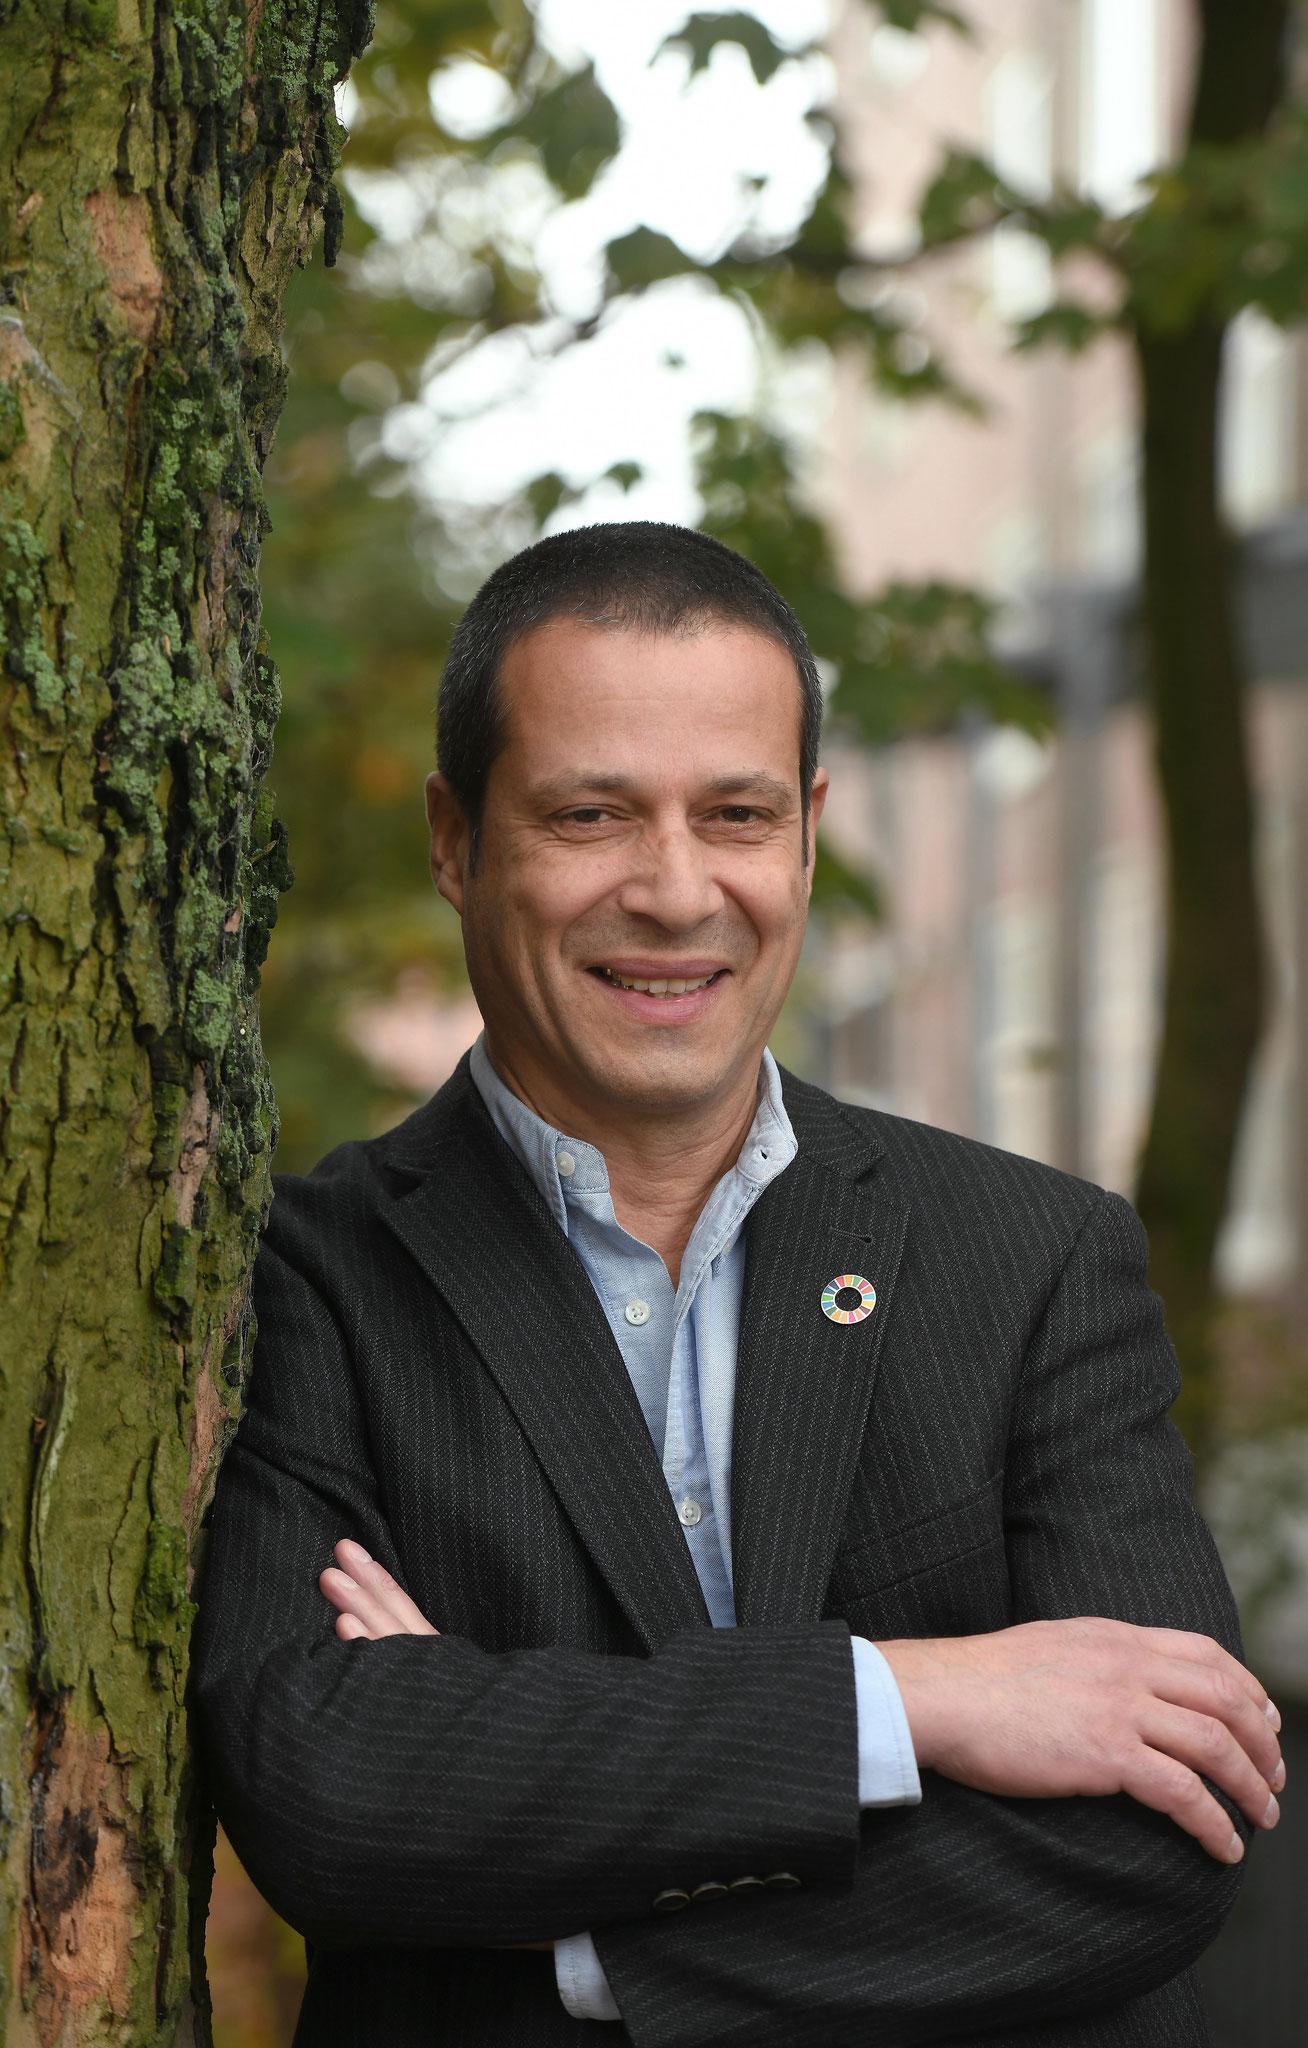 Frank Schweikert